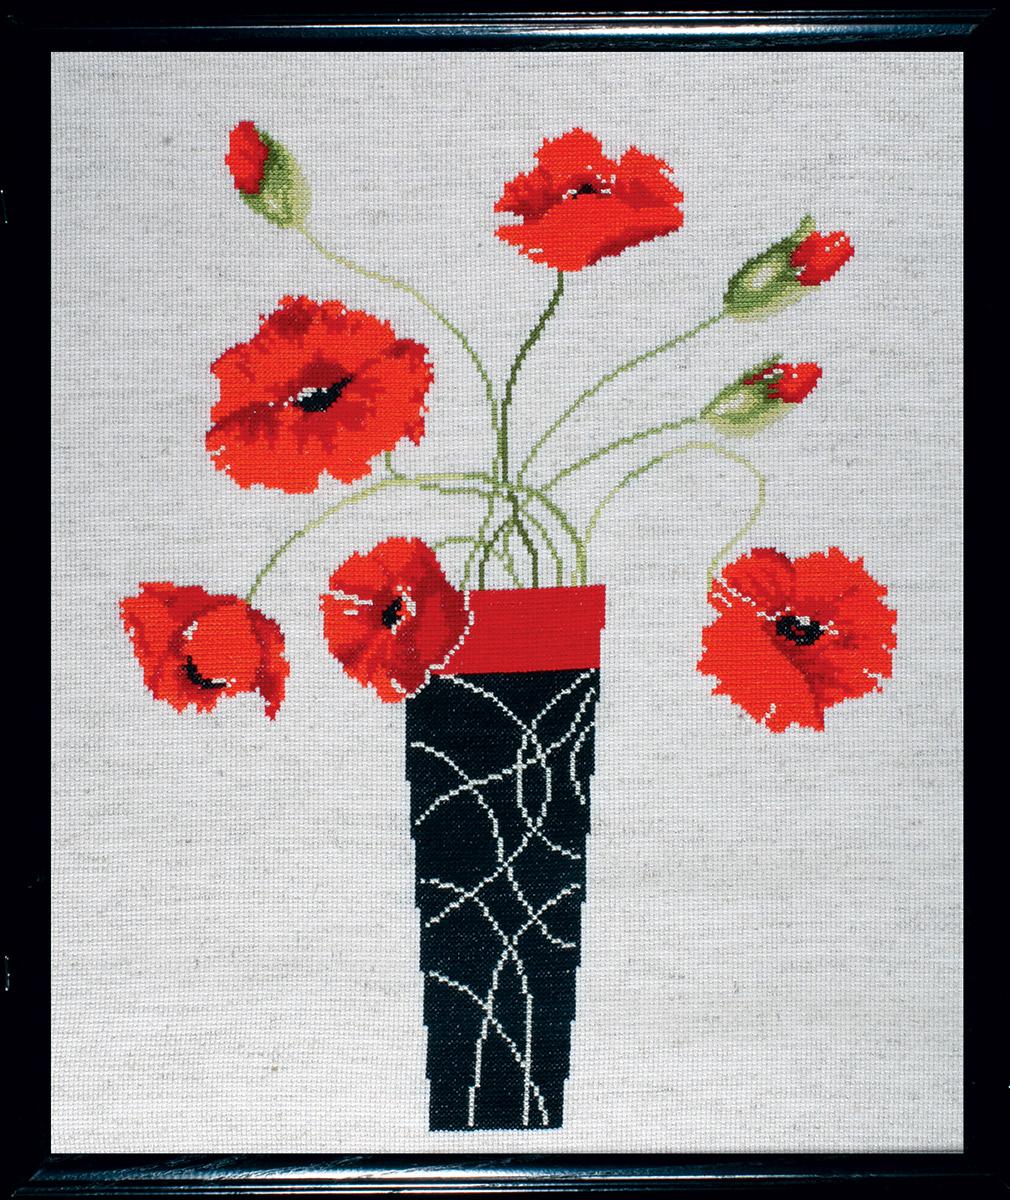 Набор для вышивания крестом Design Works Маки в вазе, 32,5 х 40 см2436Дизайнер Мэрилин Робертсон (Poppies in Vase, Marilyn Robertson).